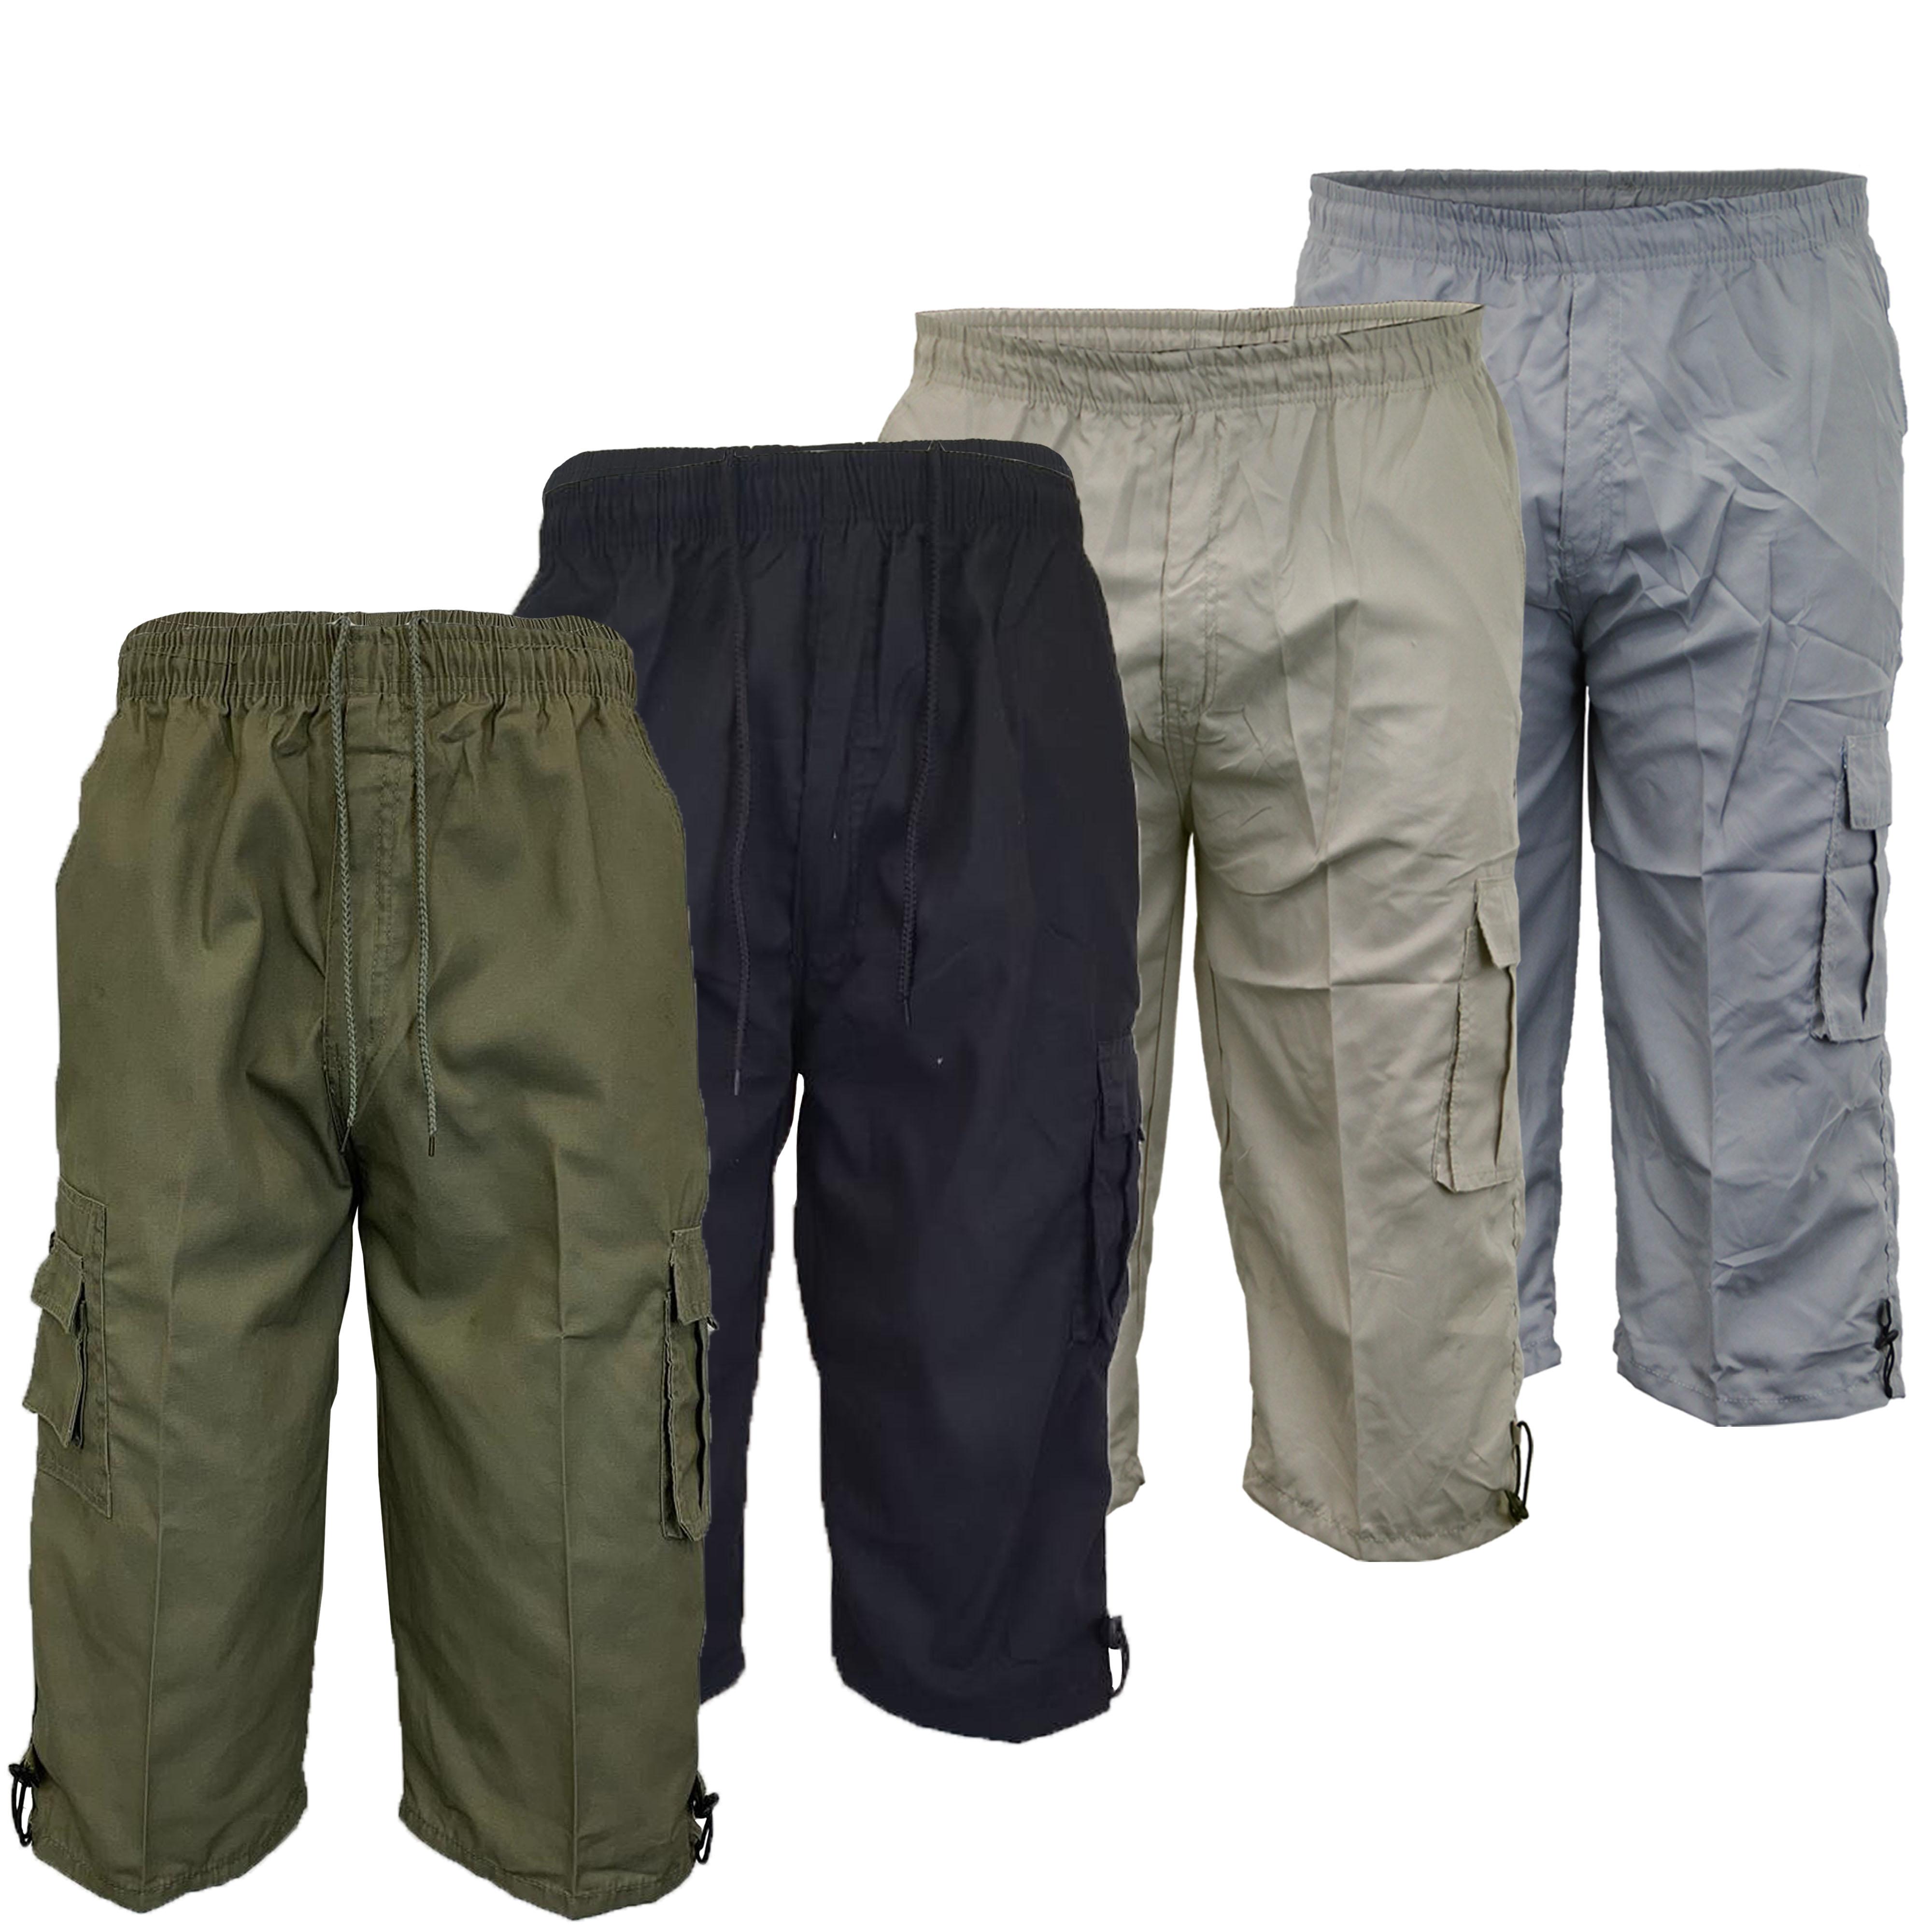 Mens-Combat-Cargo-Shorts-3-4-Length-Plain-Sport-Fashion-Casual-Summer-New thumbnail 5